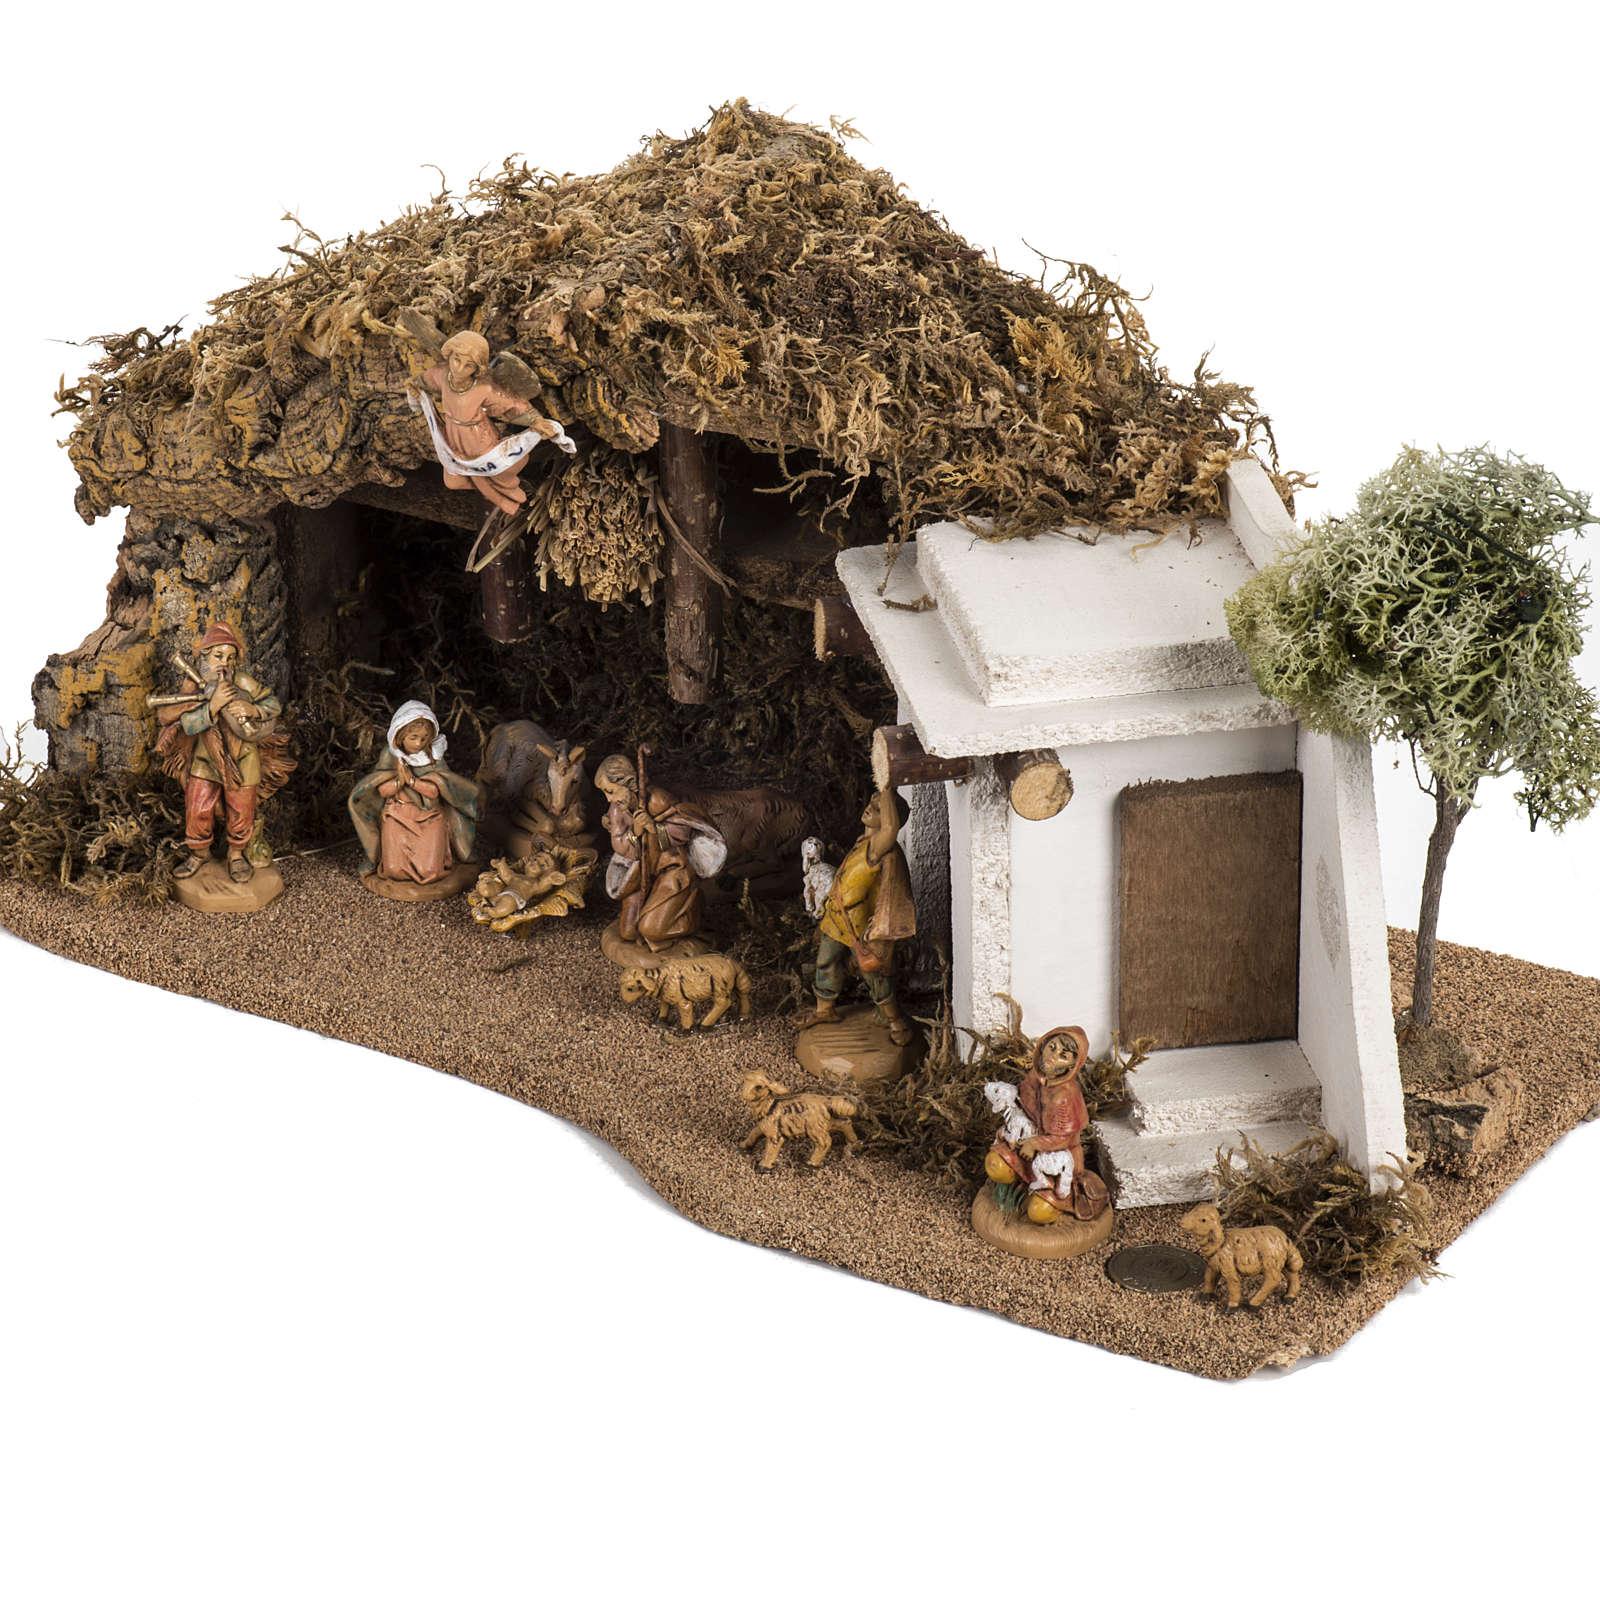 Capanna con casa araba presepe Fontanini 6.5 cm 4